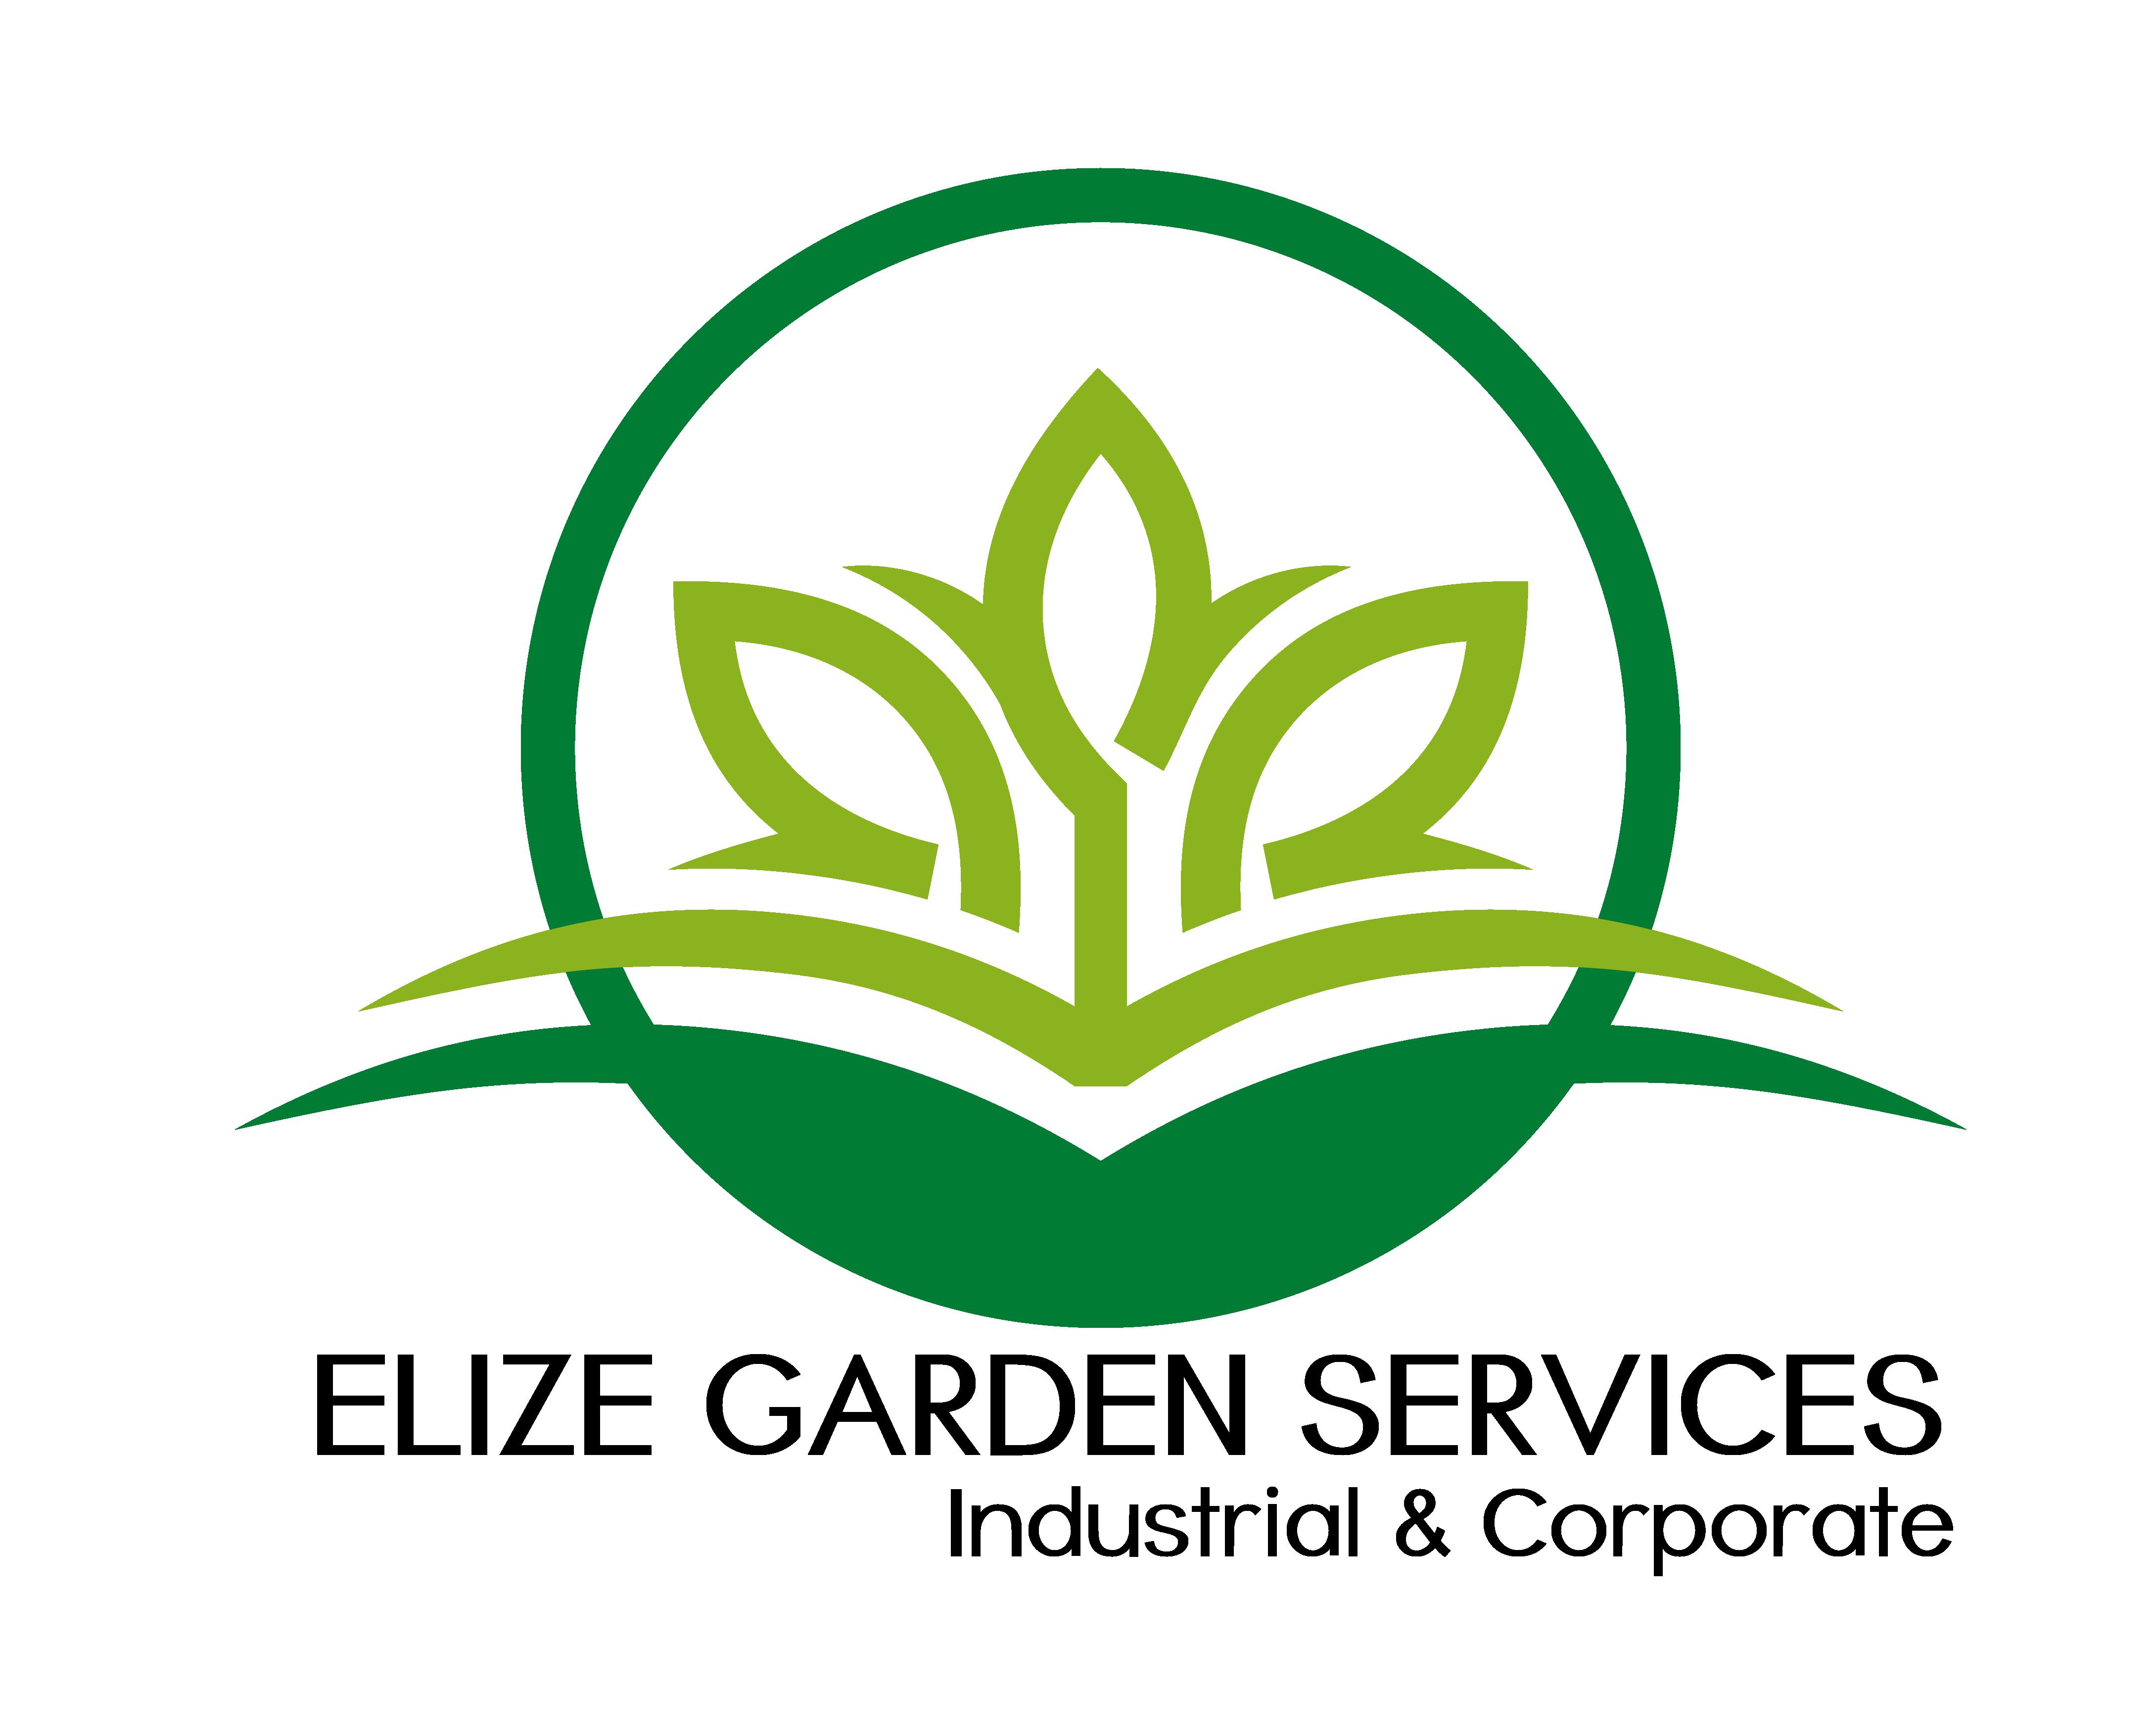 Elize Garden Services